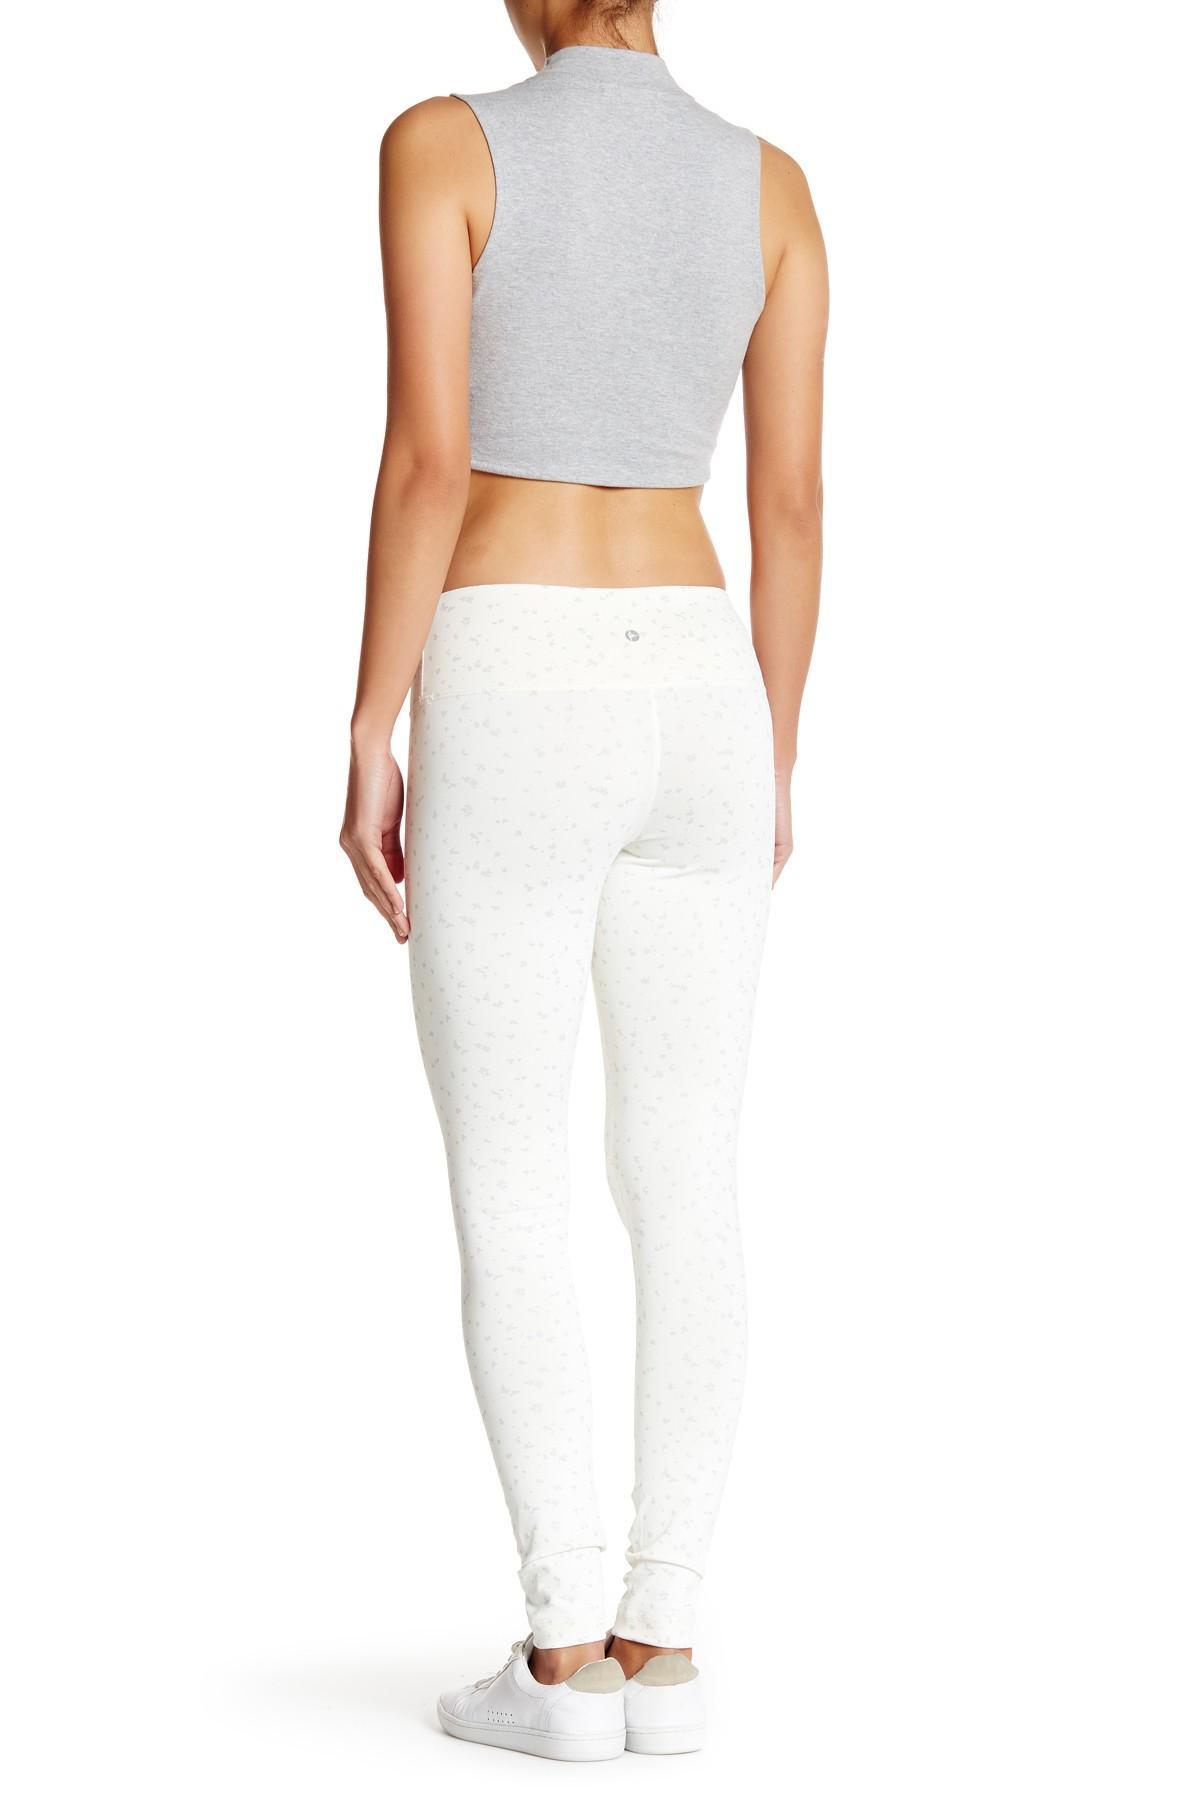 Lyst 90 Degree By Reflex Patterned Legging In White